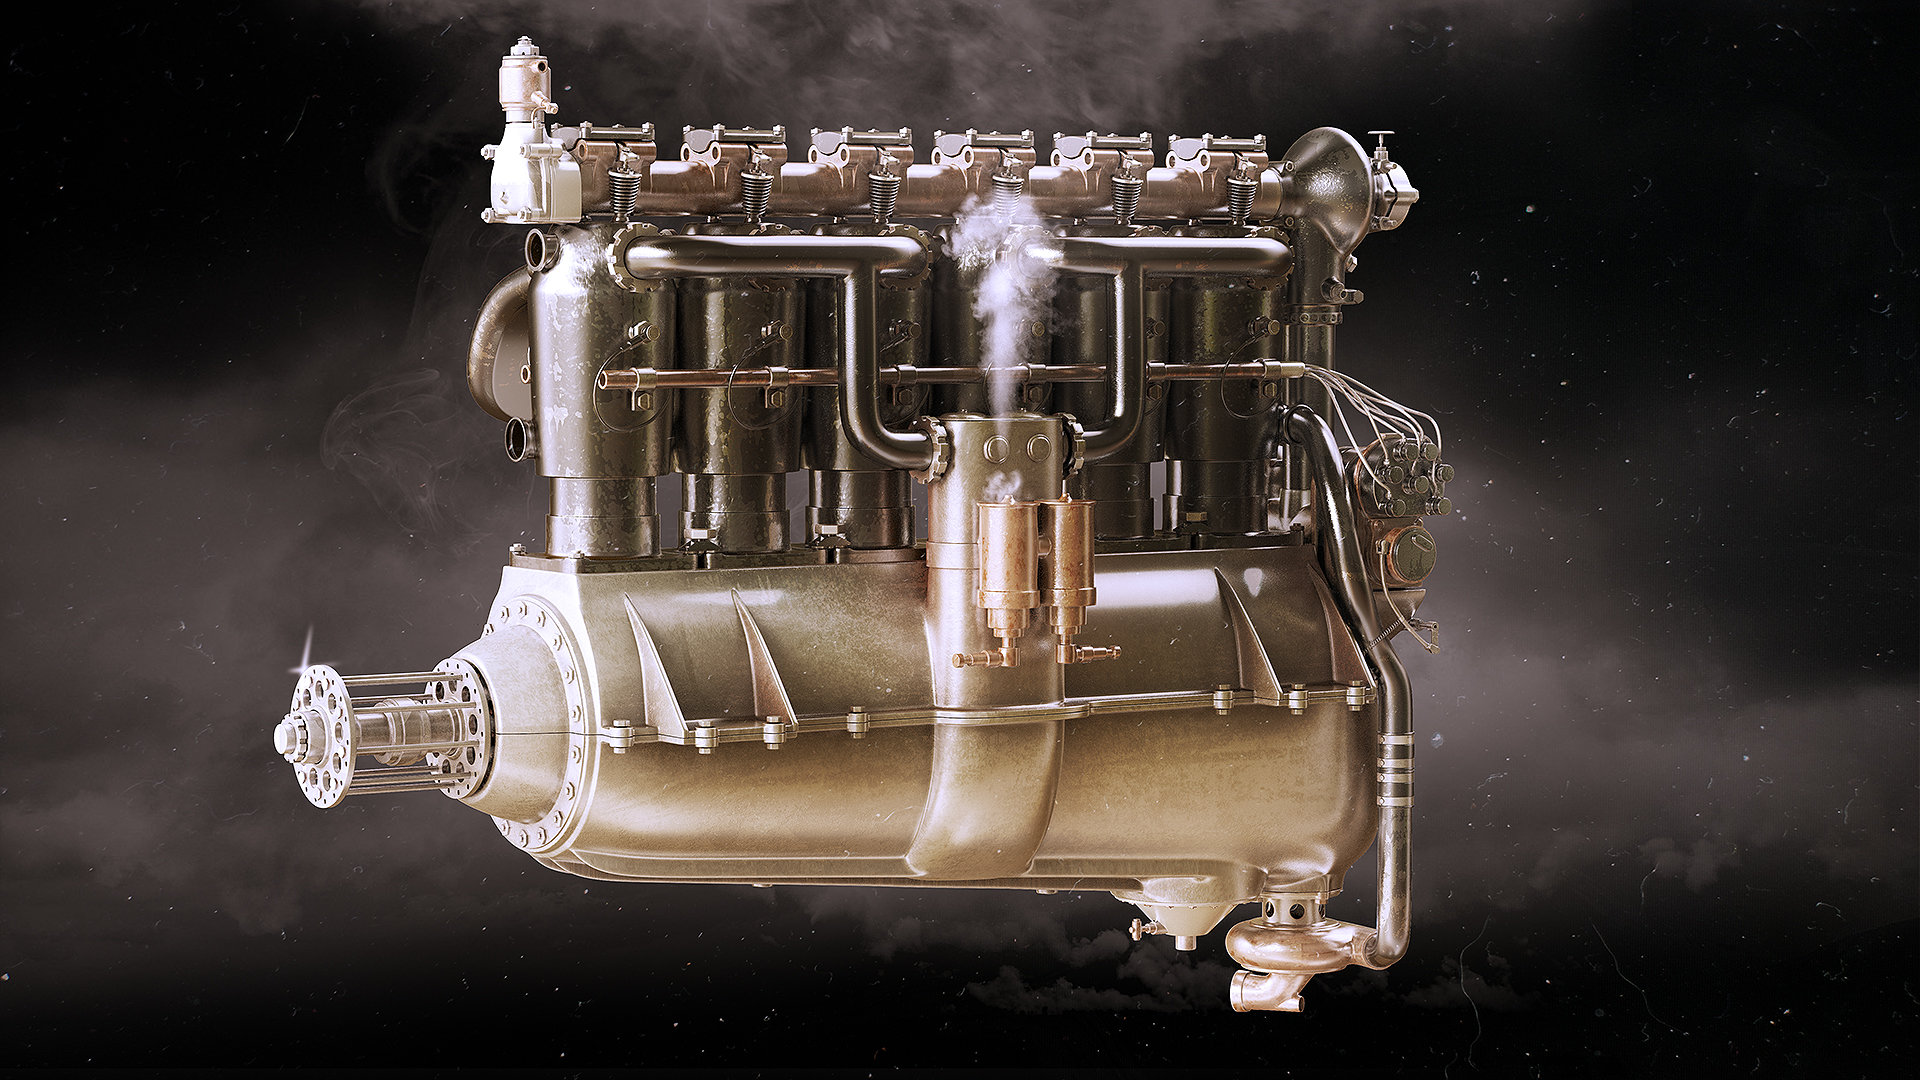 Alexandr novitskiy mercedes diii engine 01